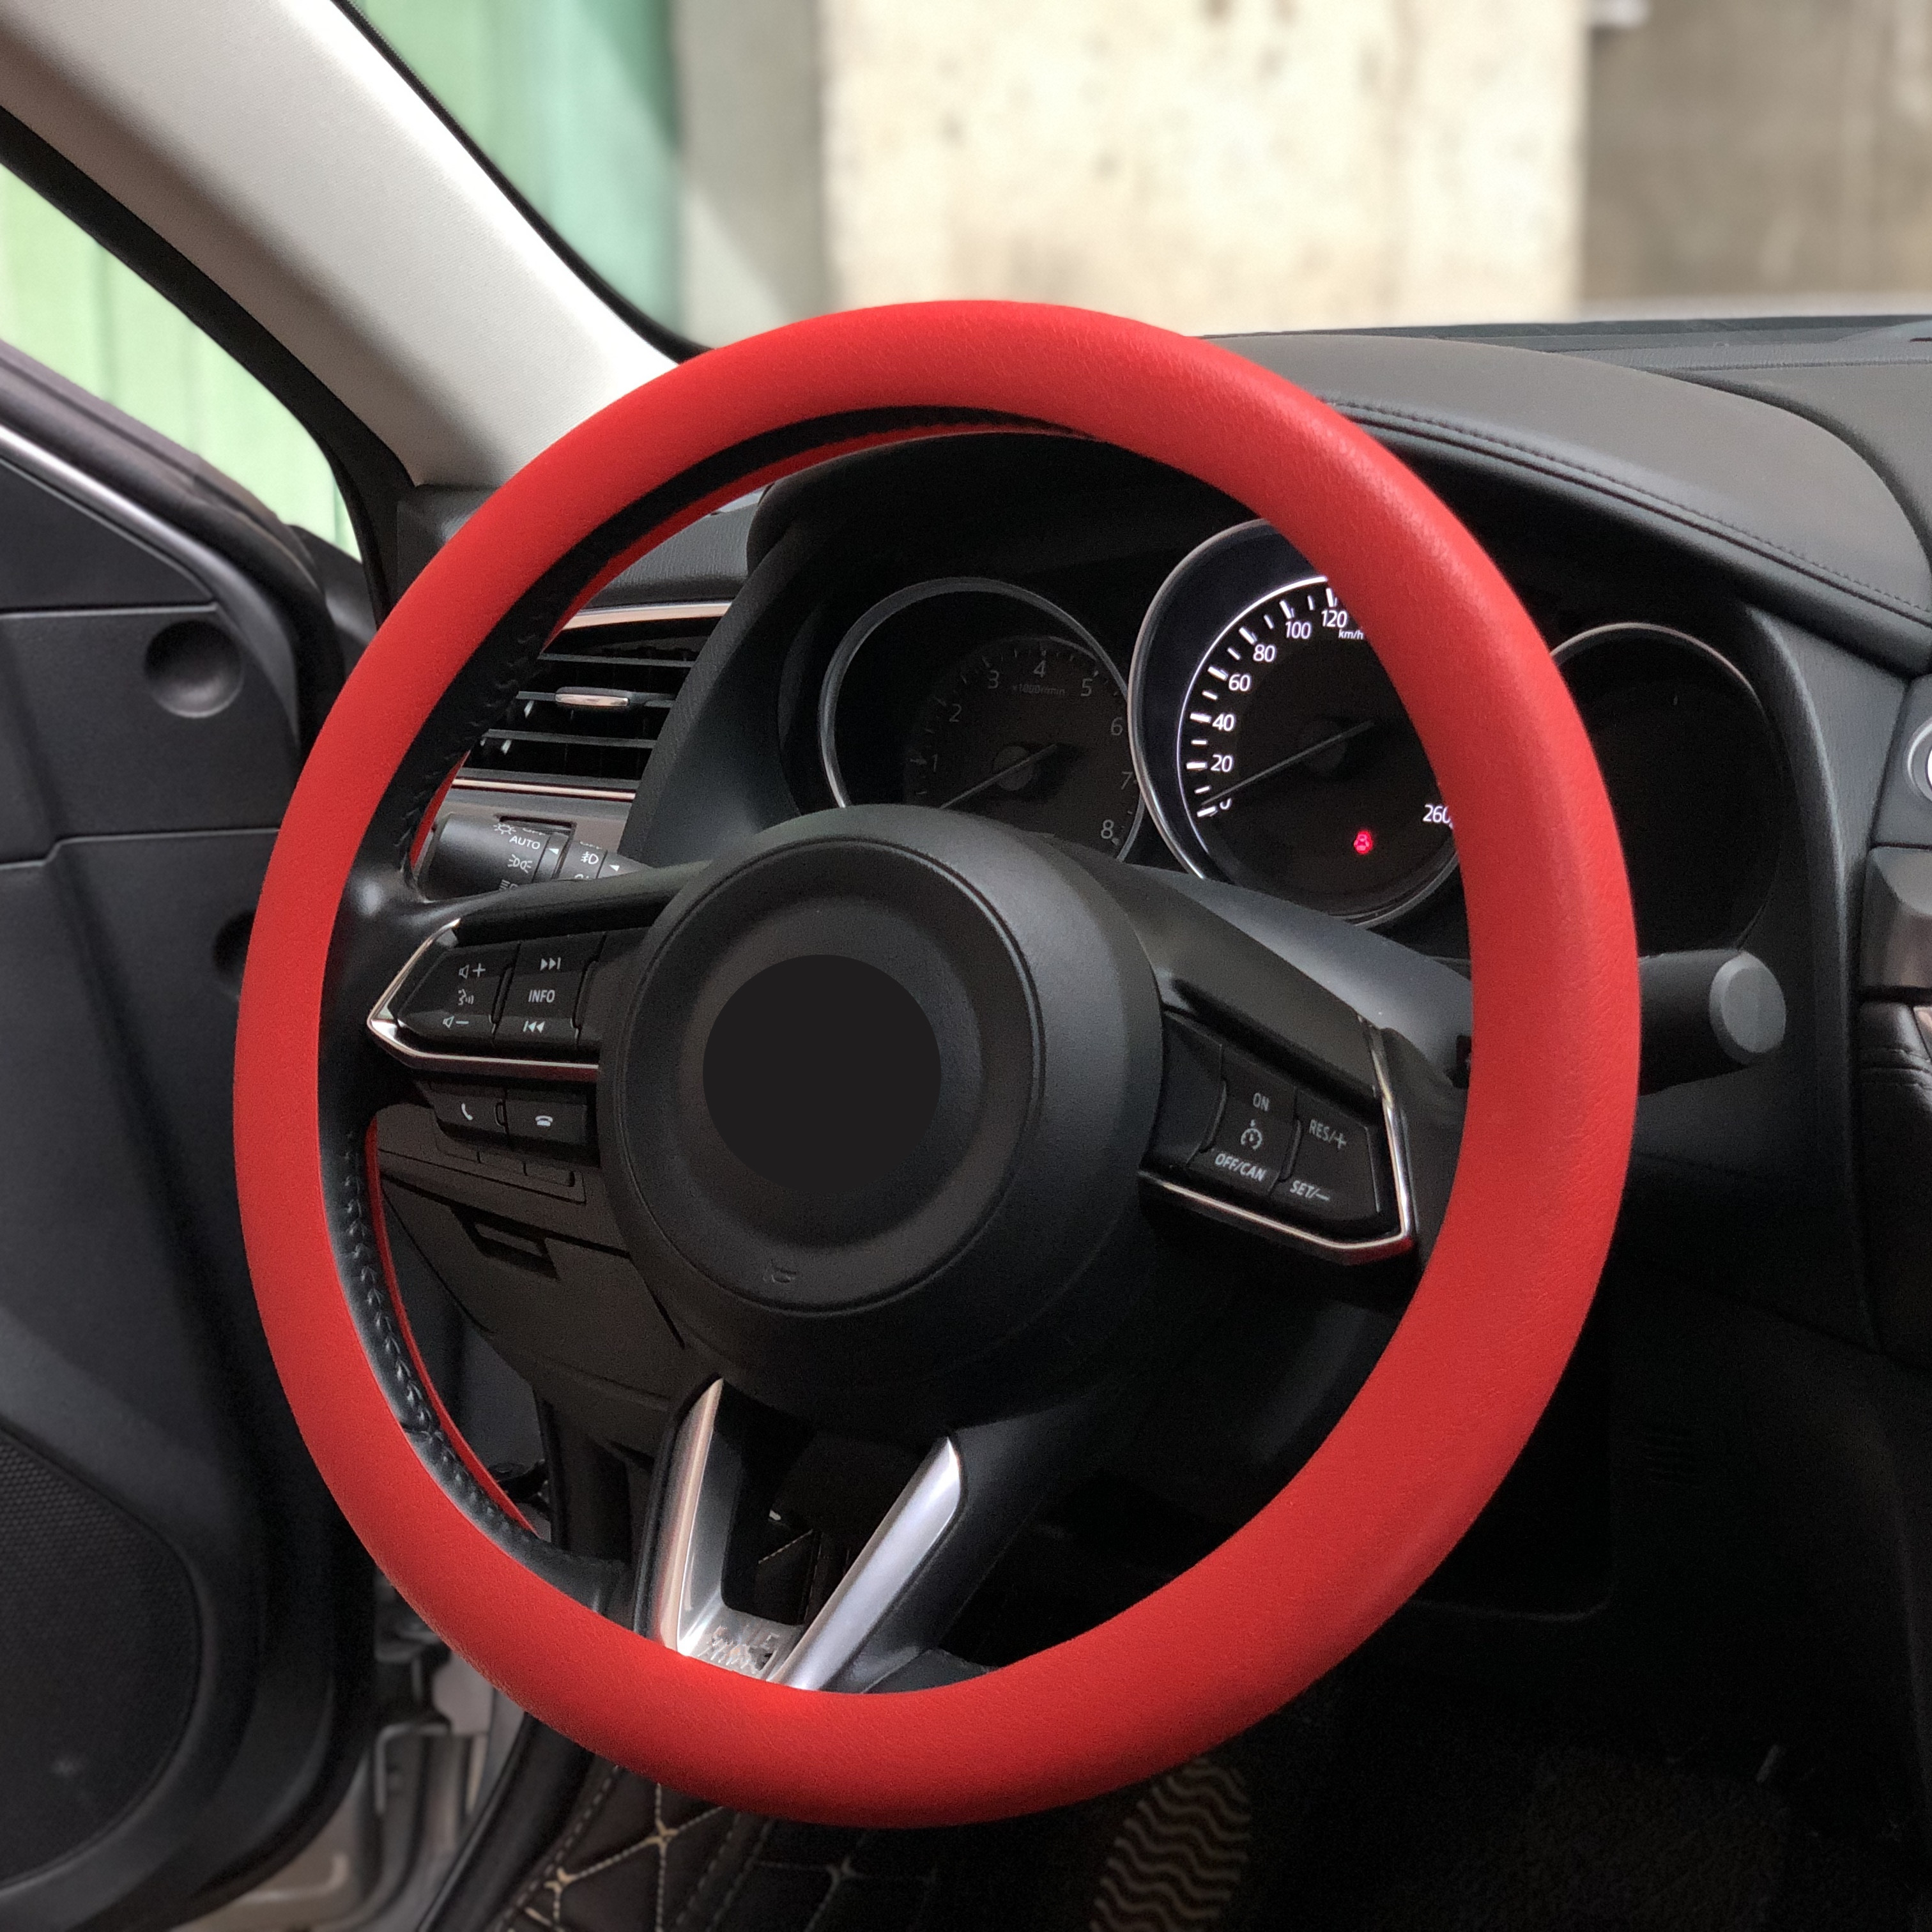 Car Silicone Steering Wheel Cover For Ford Mustang Ranger Figo KA Territory FLEX Transit Super Duty Atlas F-150 F250 F350 F450